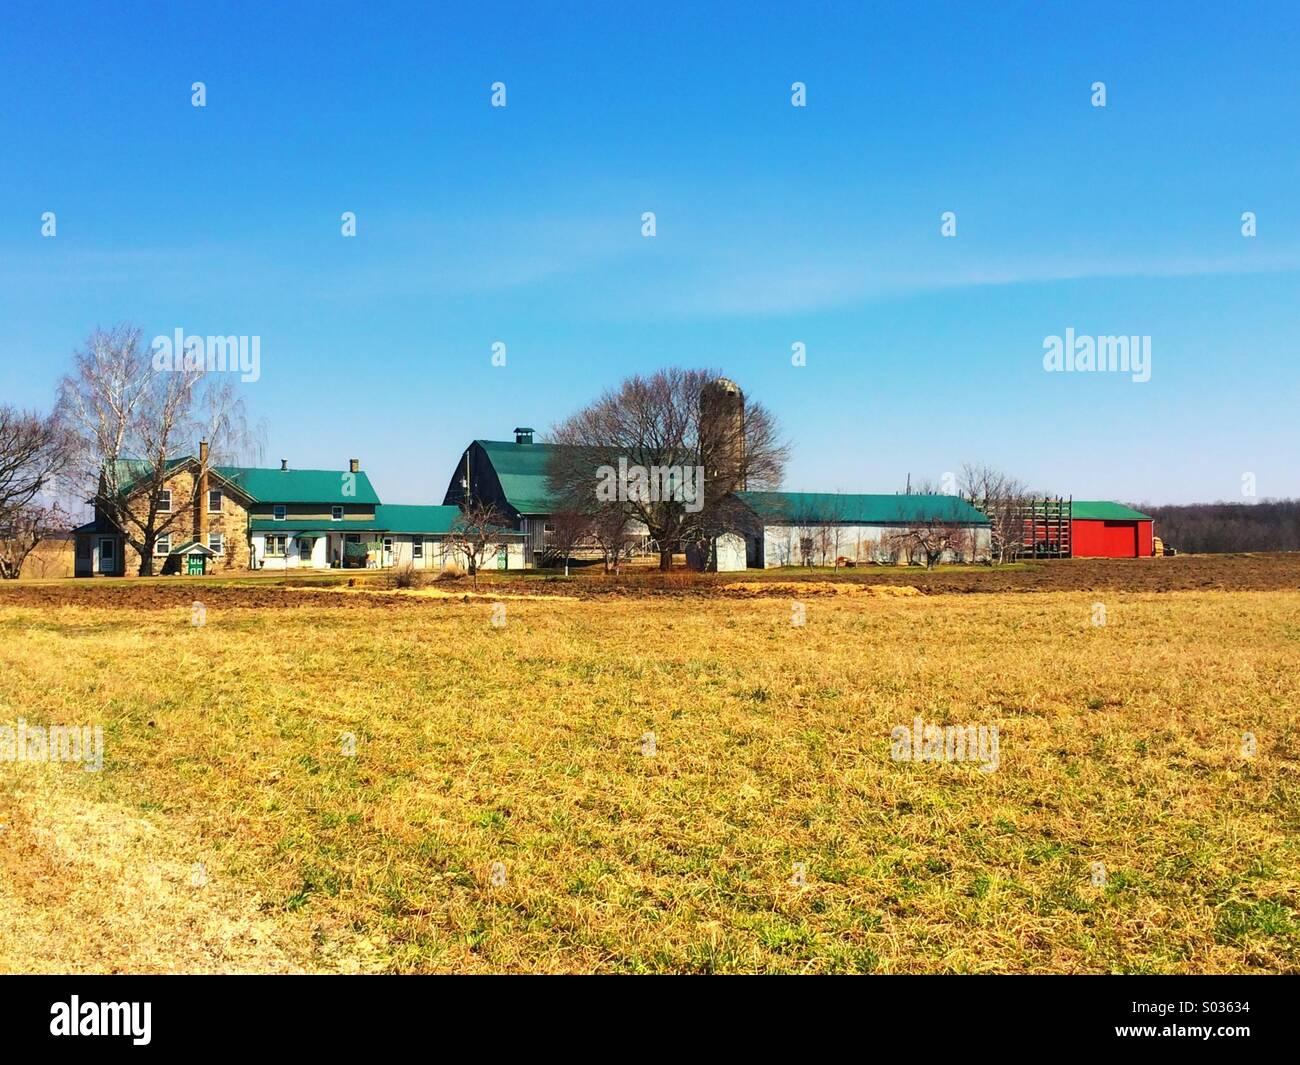 Mennonite Furniture Kitchener Mennonite Stock Photos Mennonite Stock Images Alamy